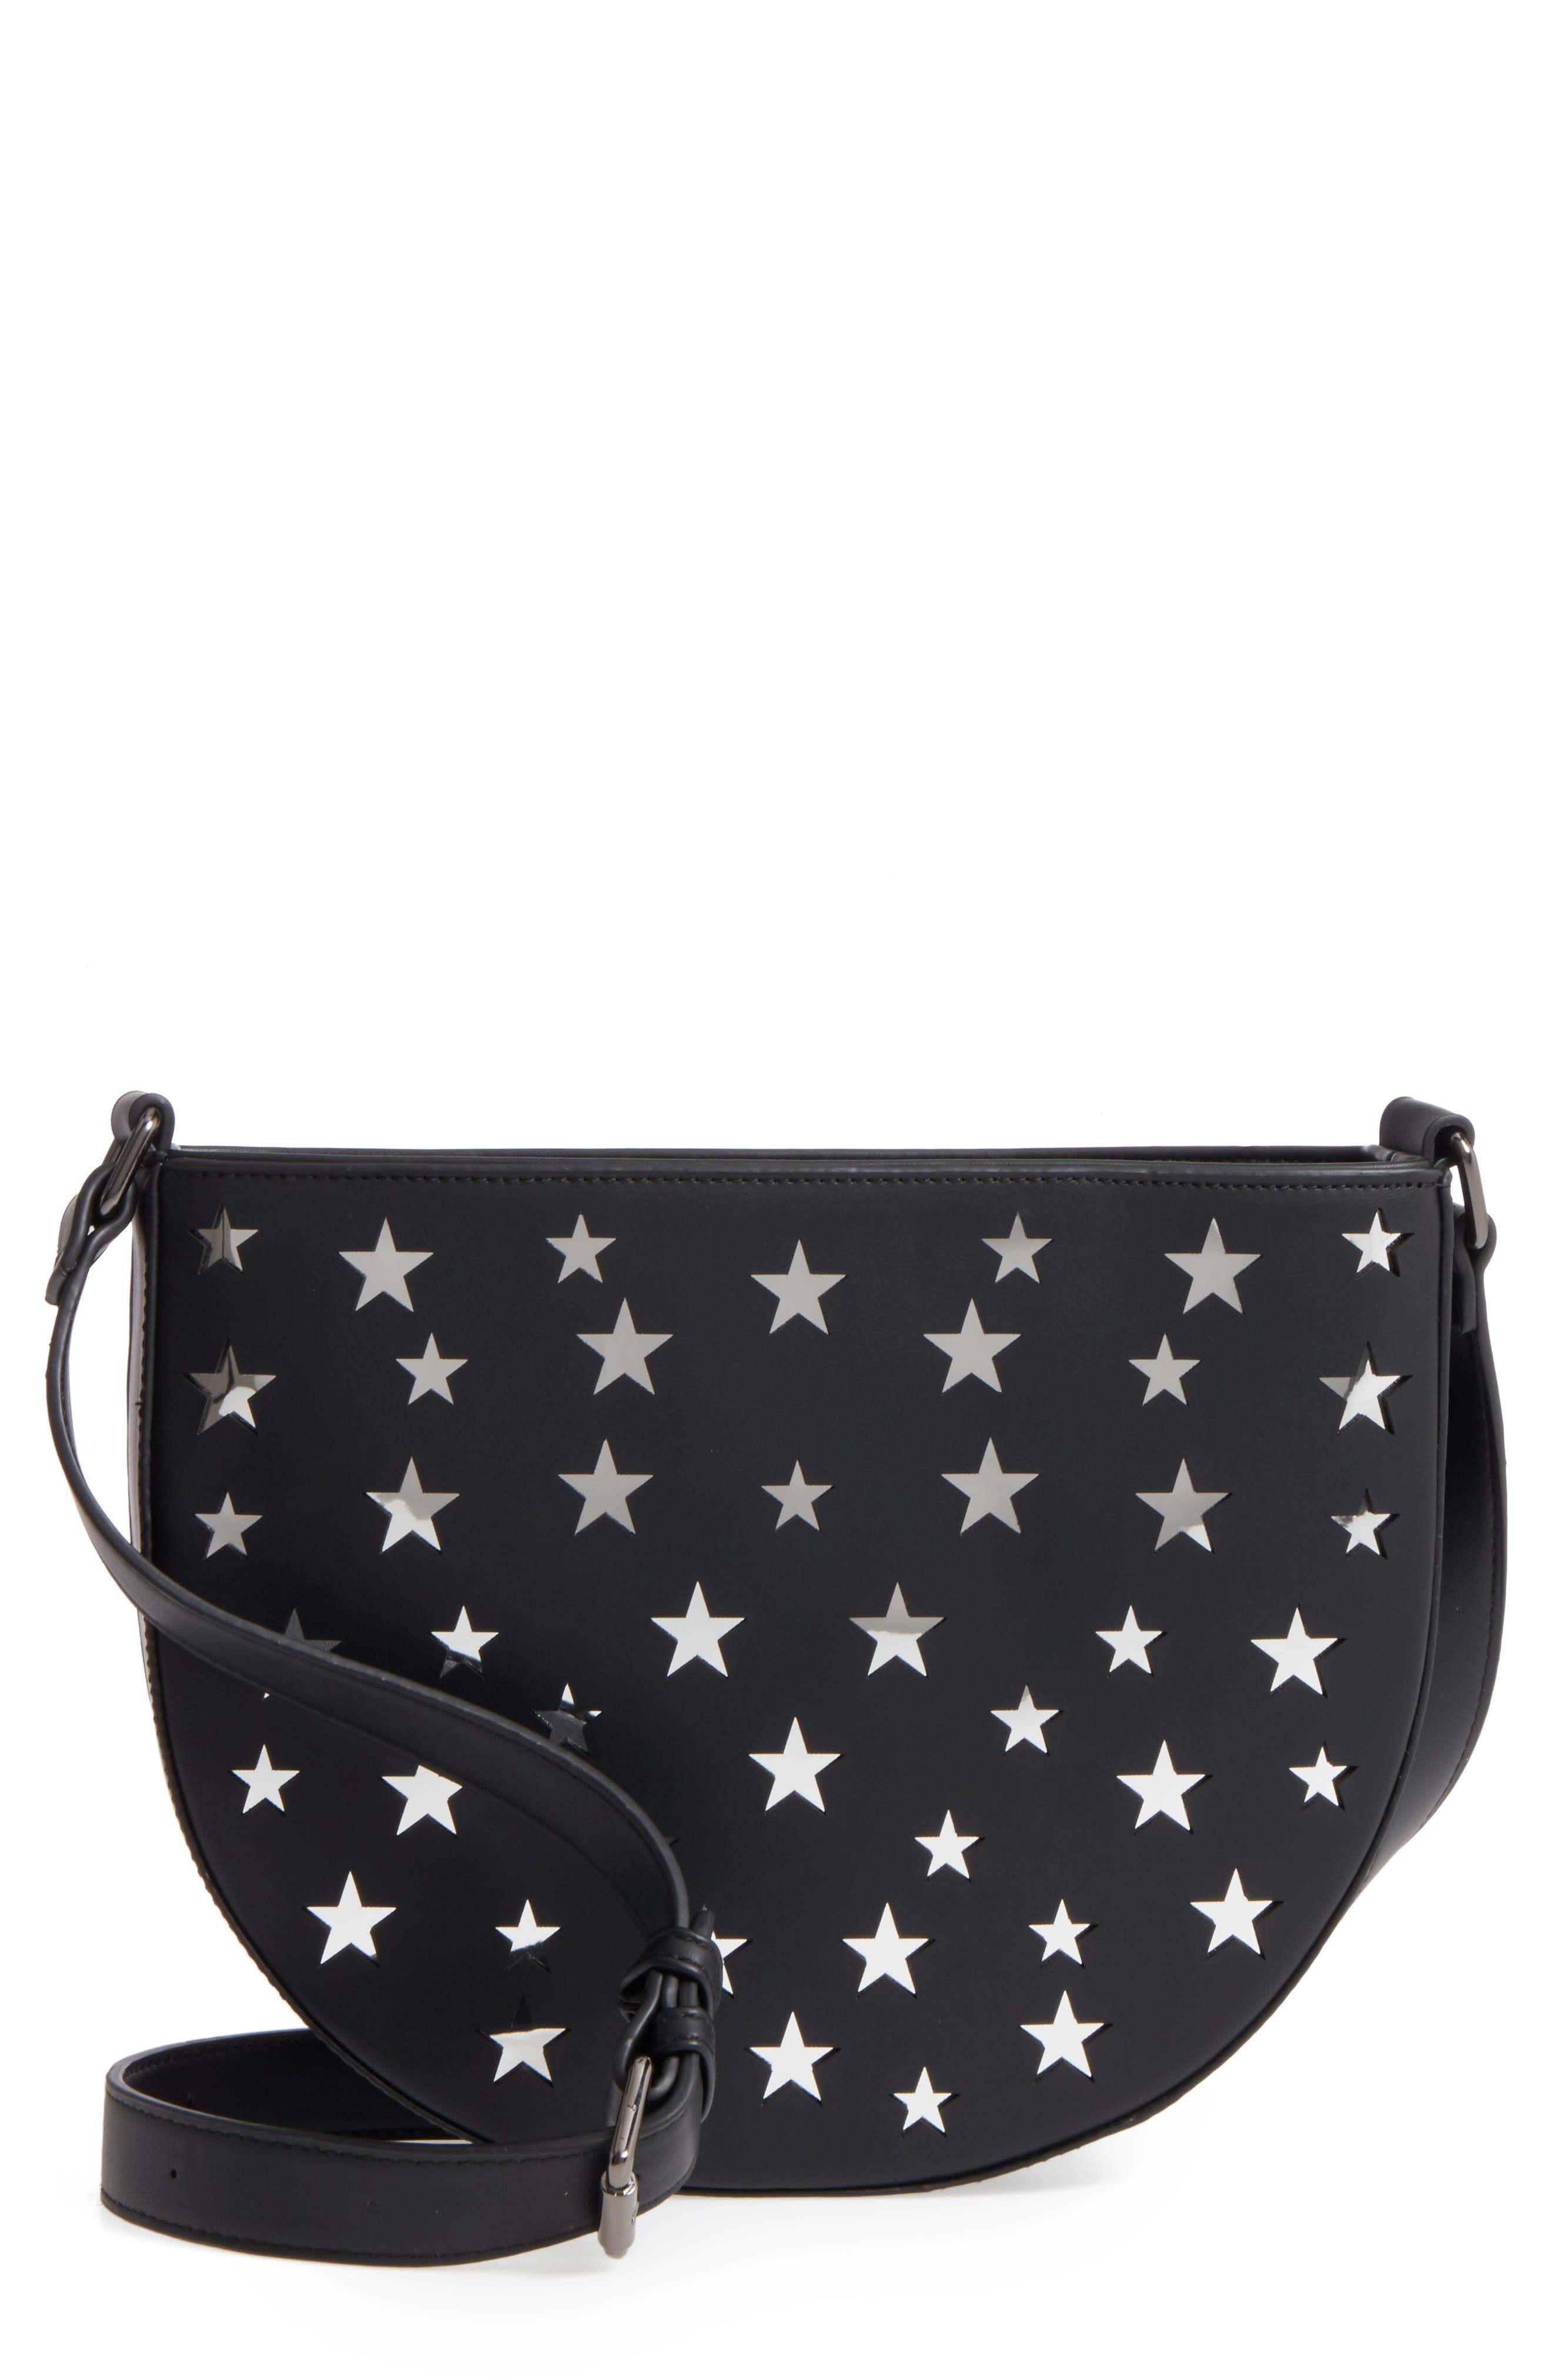 Half Moon Faux Leather Crossbody Bag,                         Main,                         color, 001